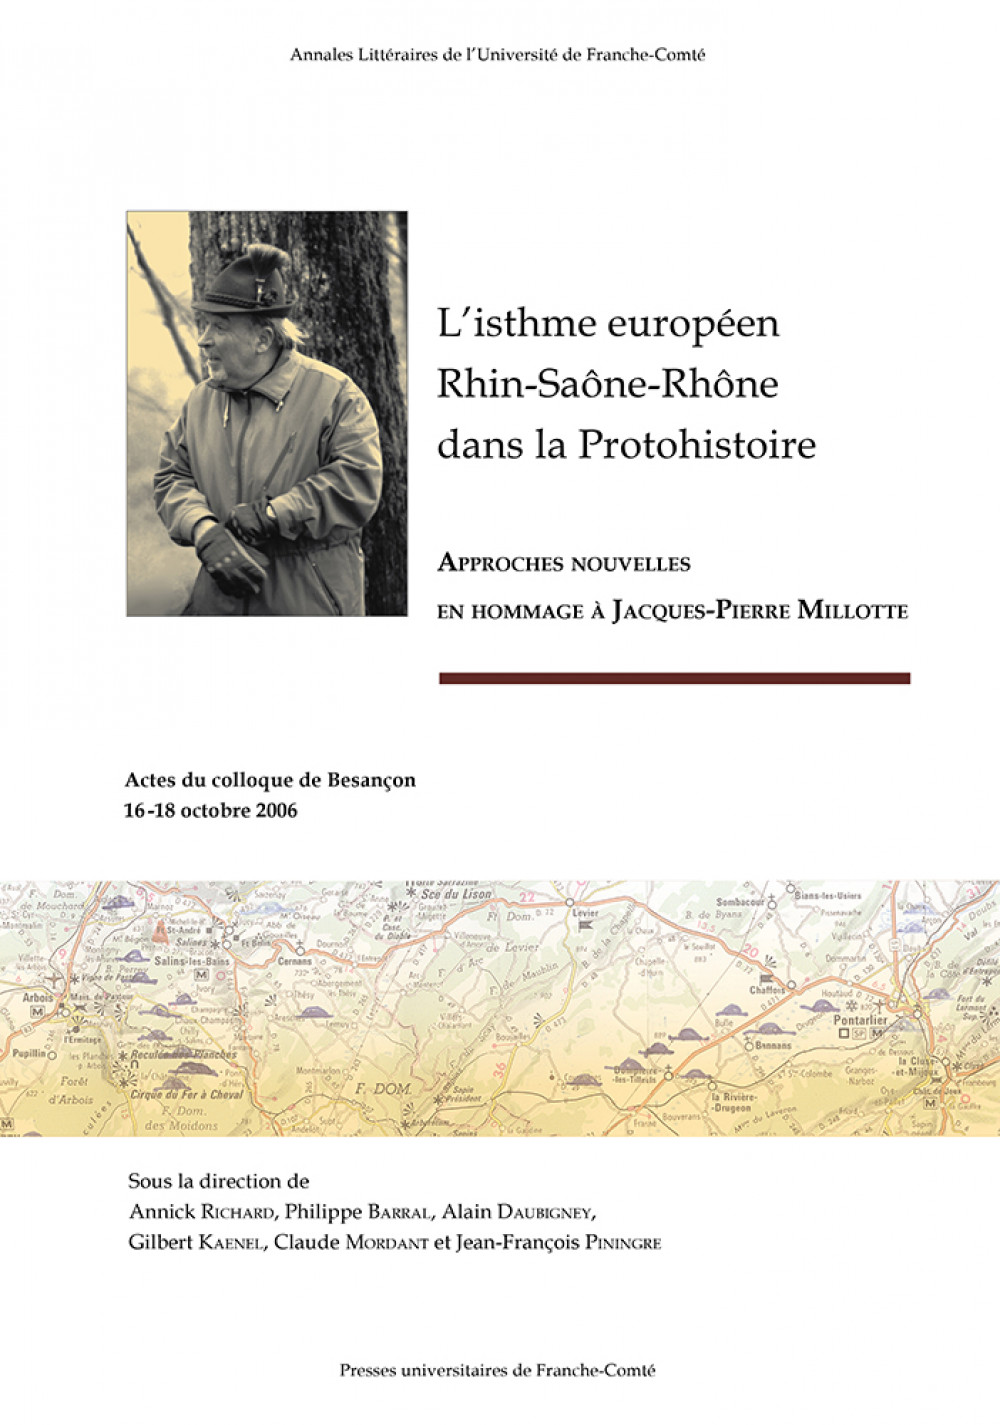 L'isthme européen Rhin-Saône-Rhône dans la Protohistoire